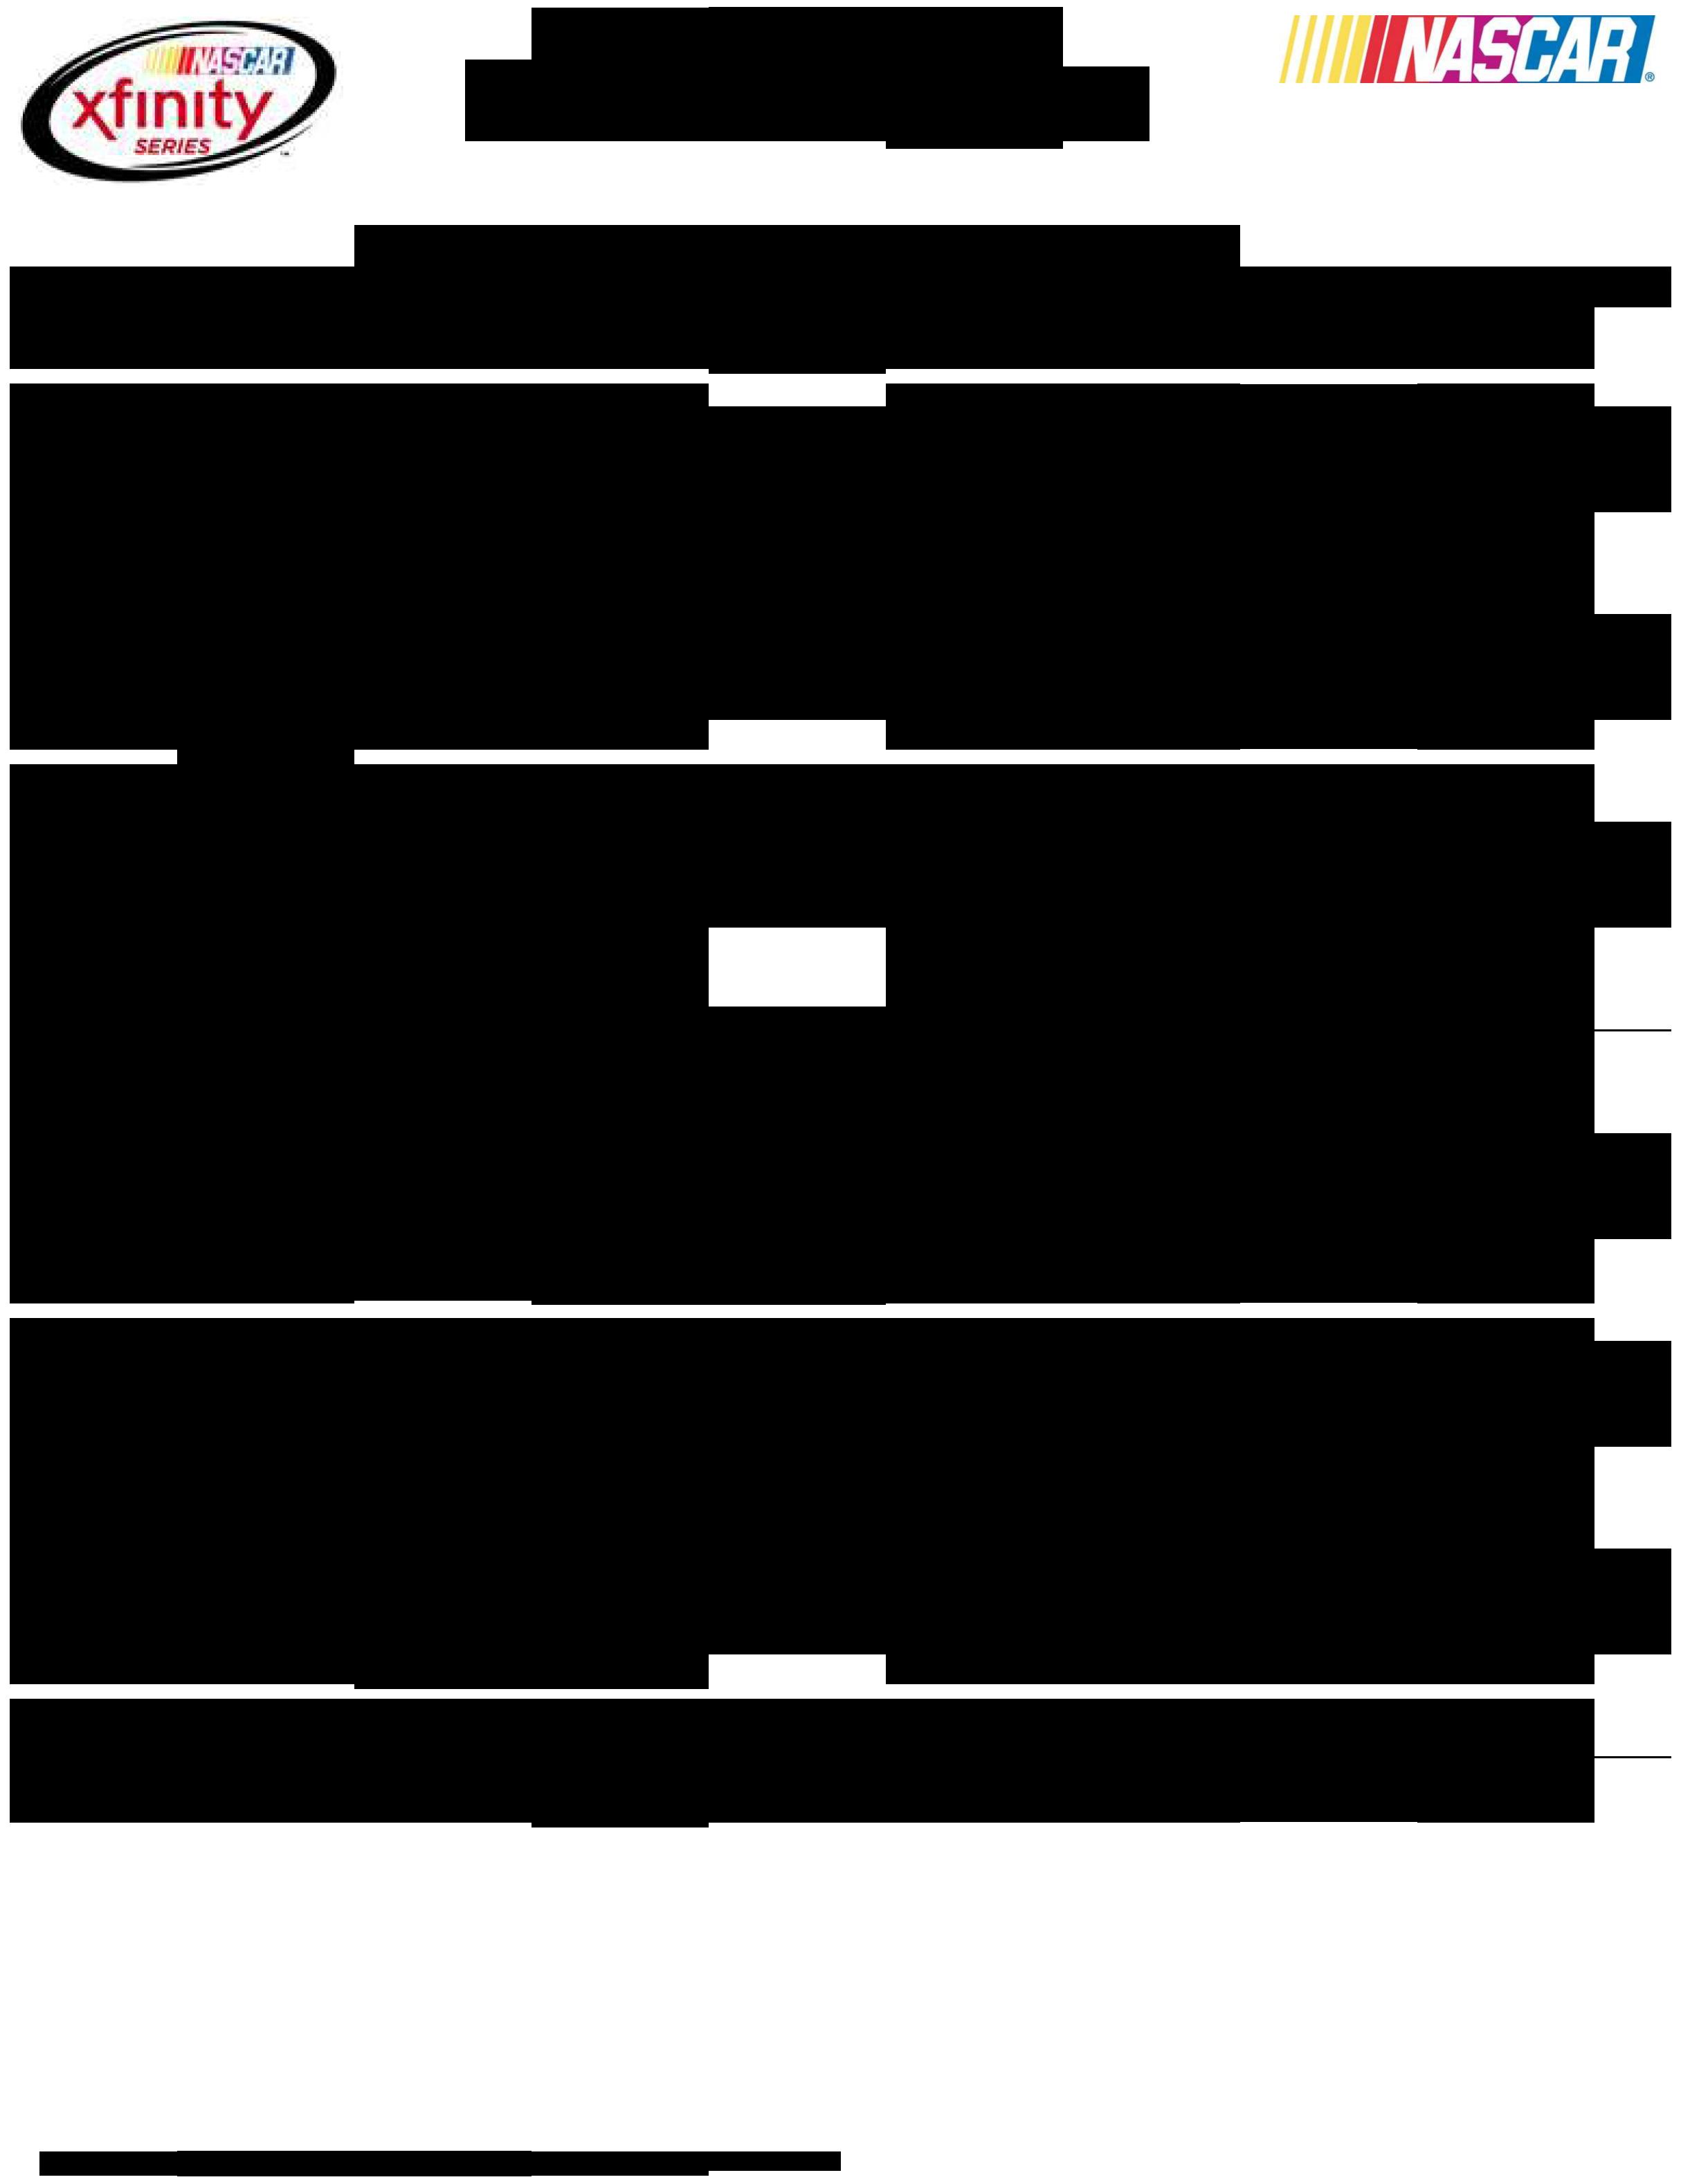 XfinityPrac1